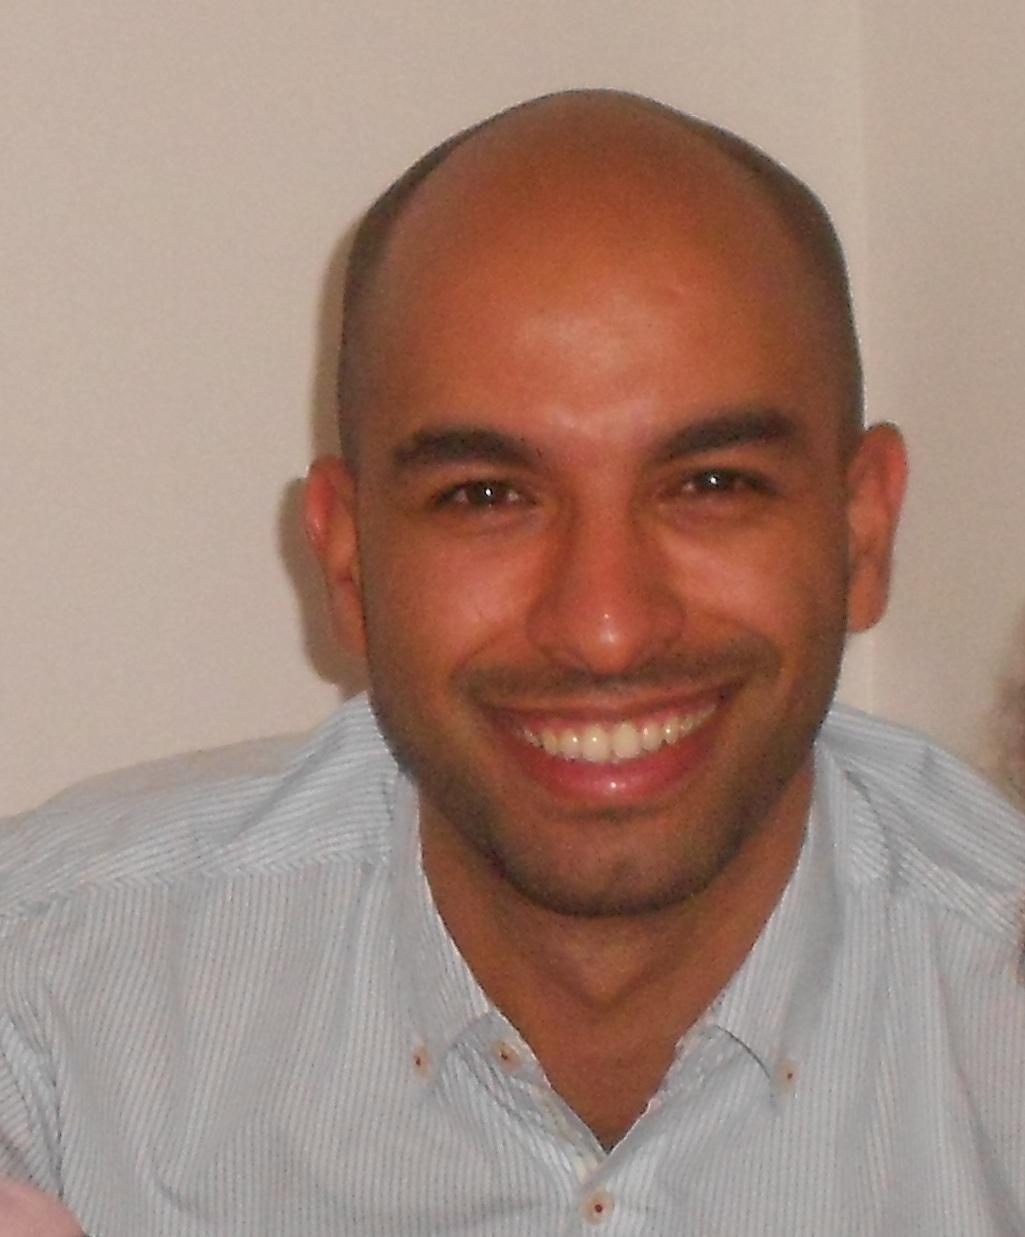 Khalid Bouaabdalli